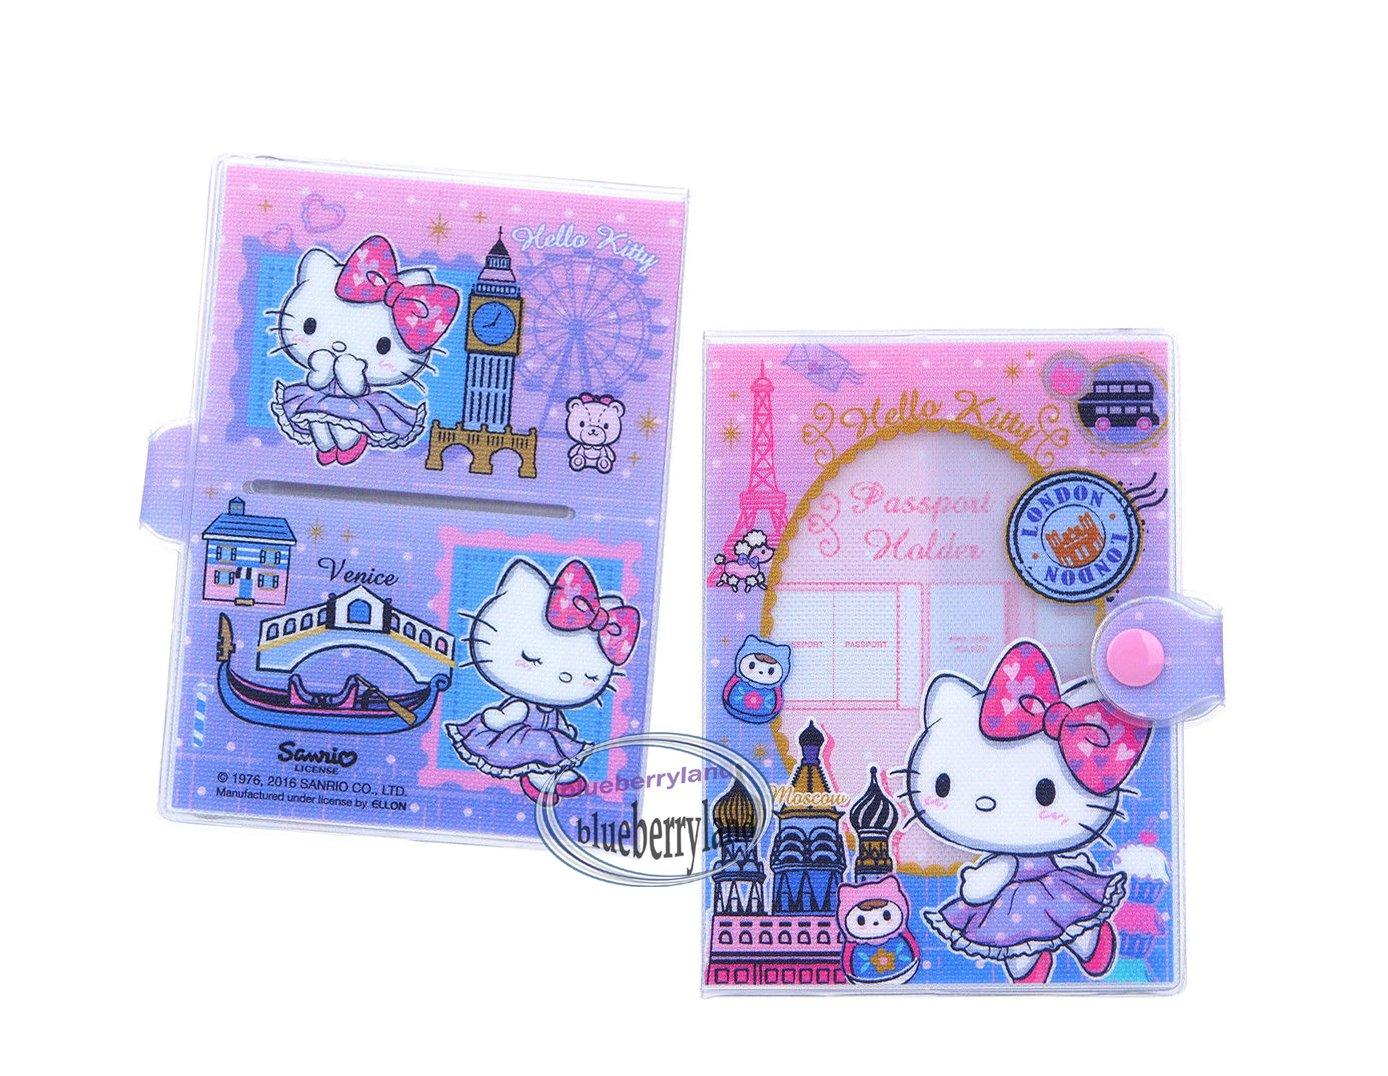 Sanrio Hello Kitty Passport Holder cover travel accessories R16